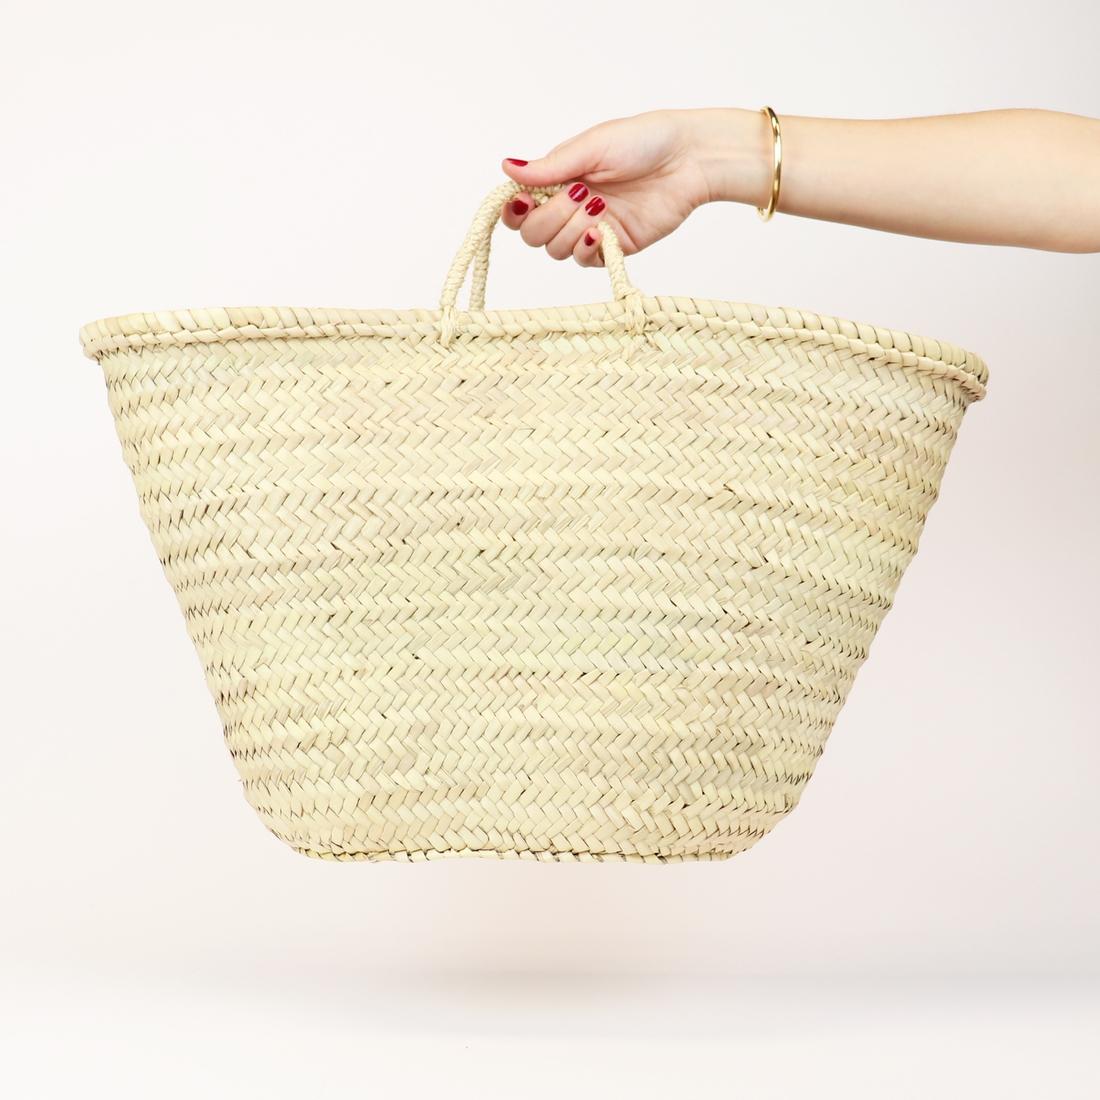 Straw Bag - Miami French Market Basket